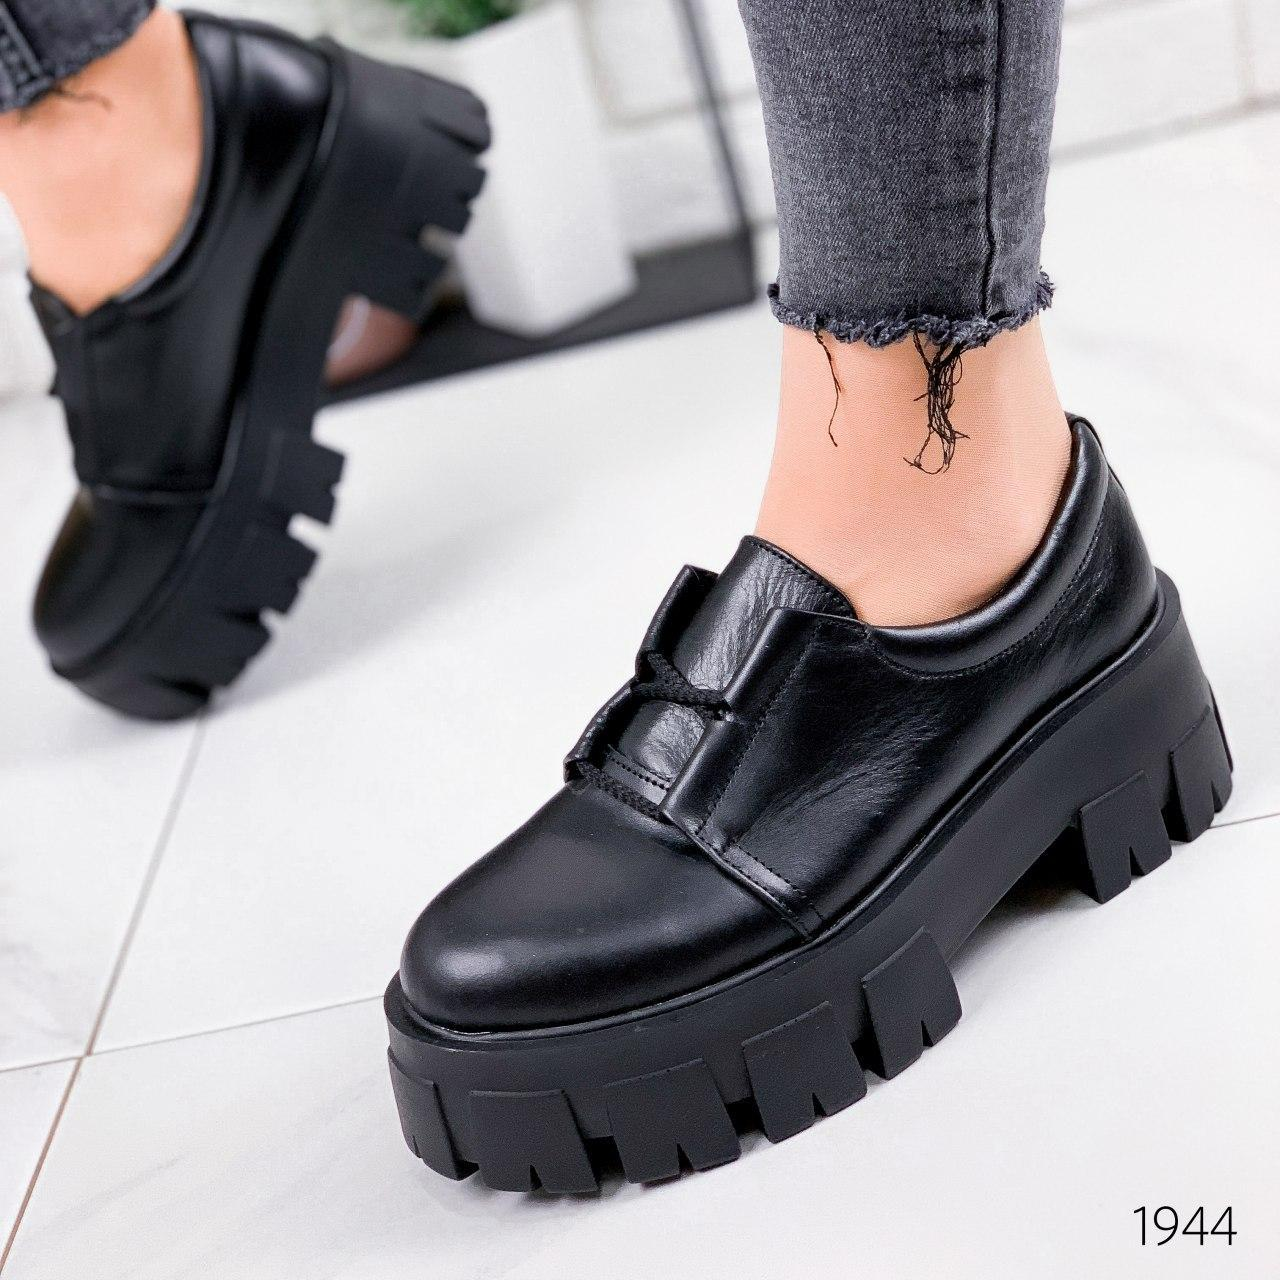 Туфли женские черные на платформе из НАТУРАЛЬНОЙ КОЖИ. Туфлі жіночі чорні на платформі